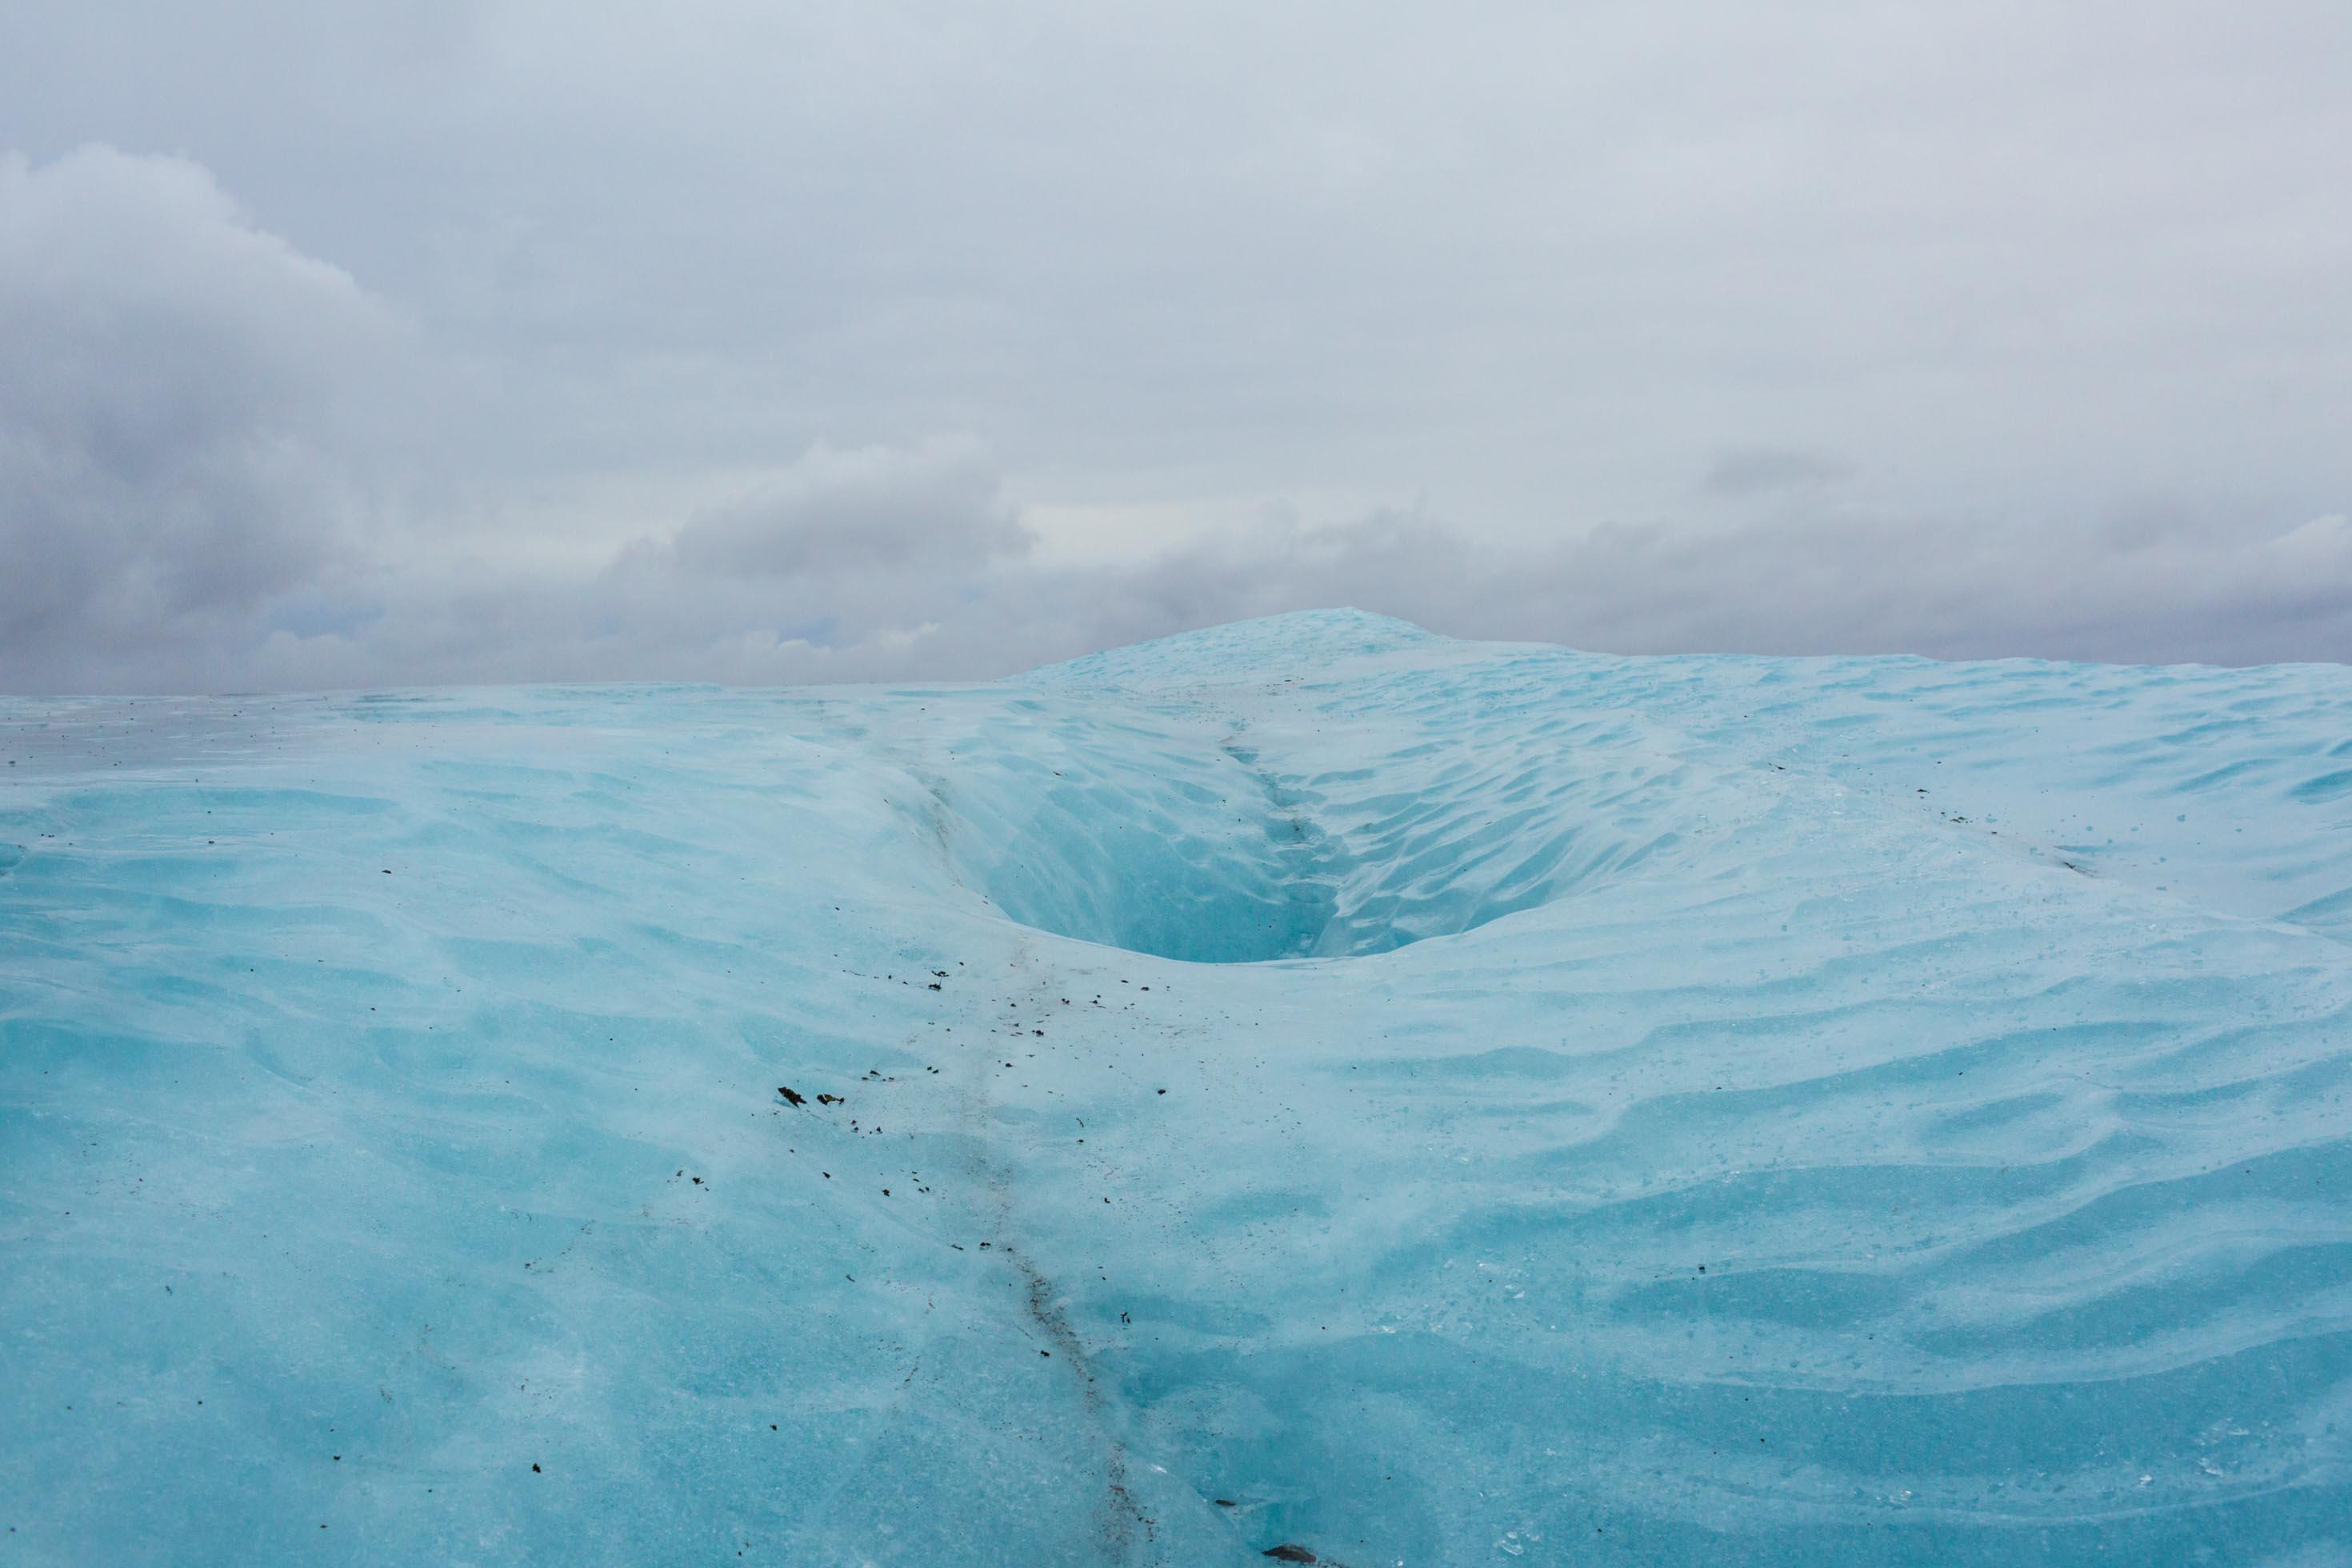 Breiðamerkurjökull glacier walk - Pictures of glaciers in Iceland.